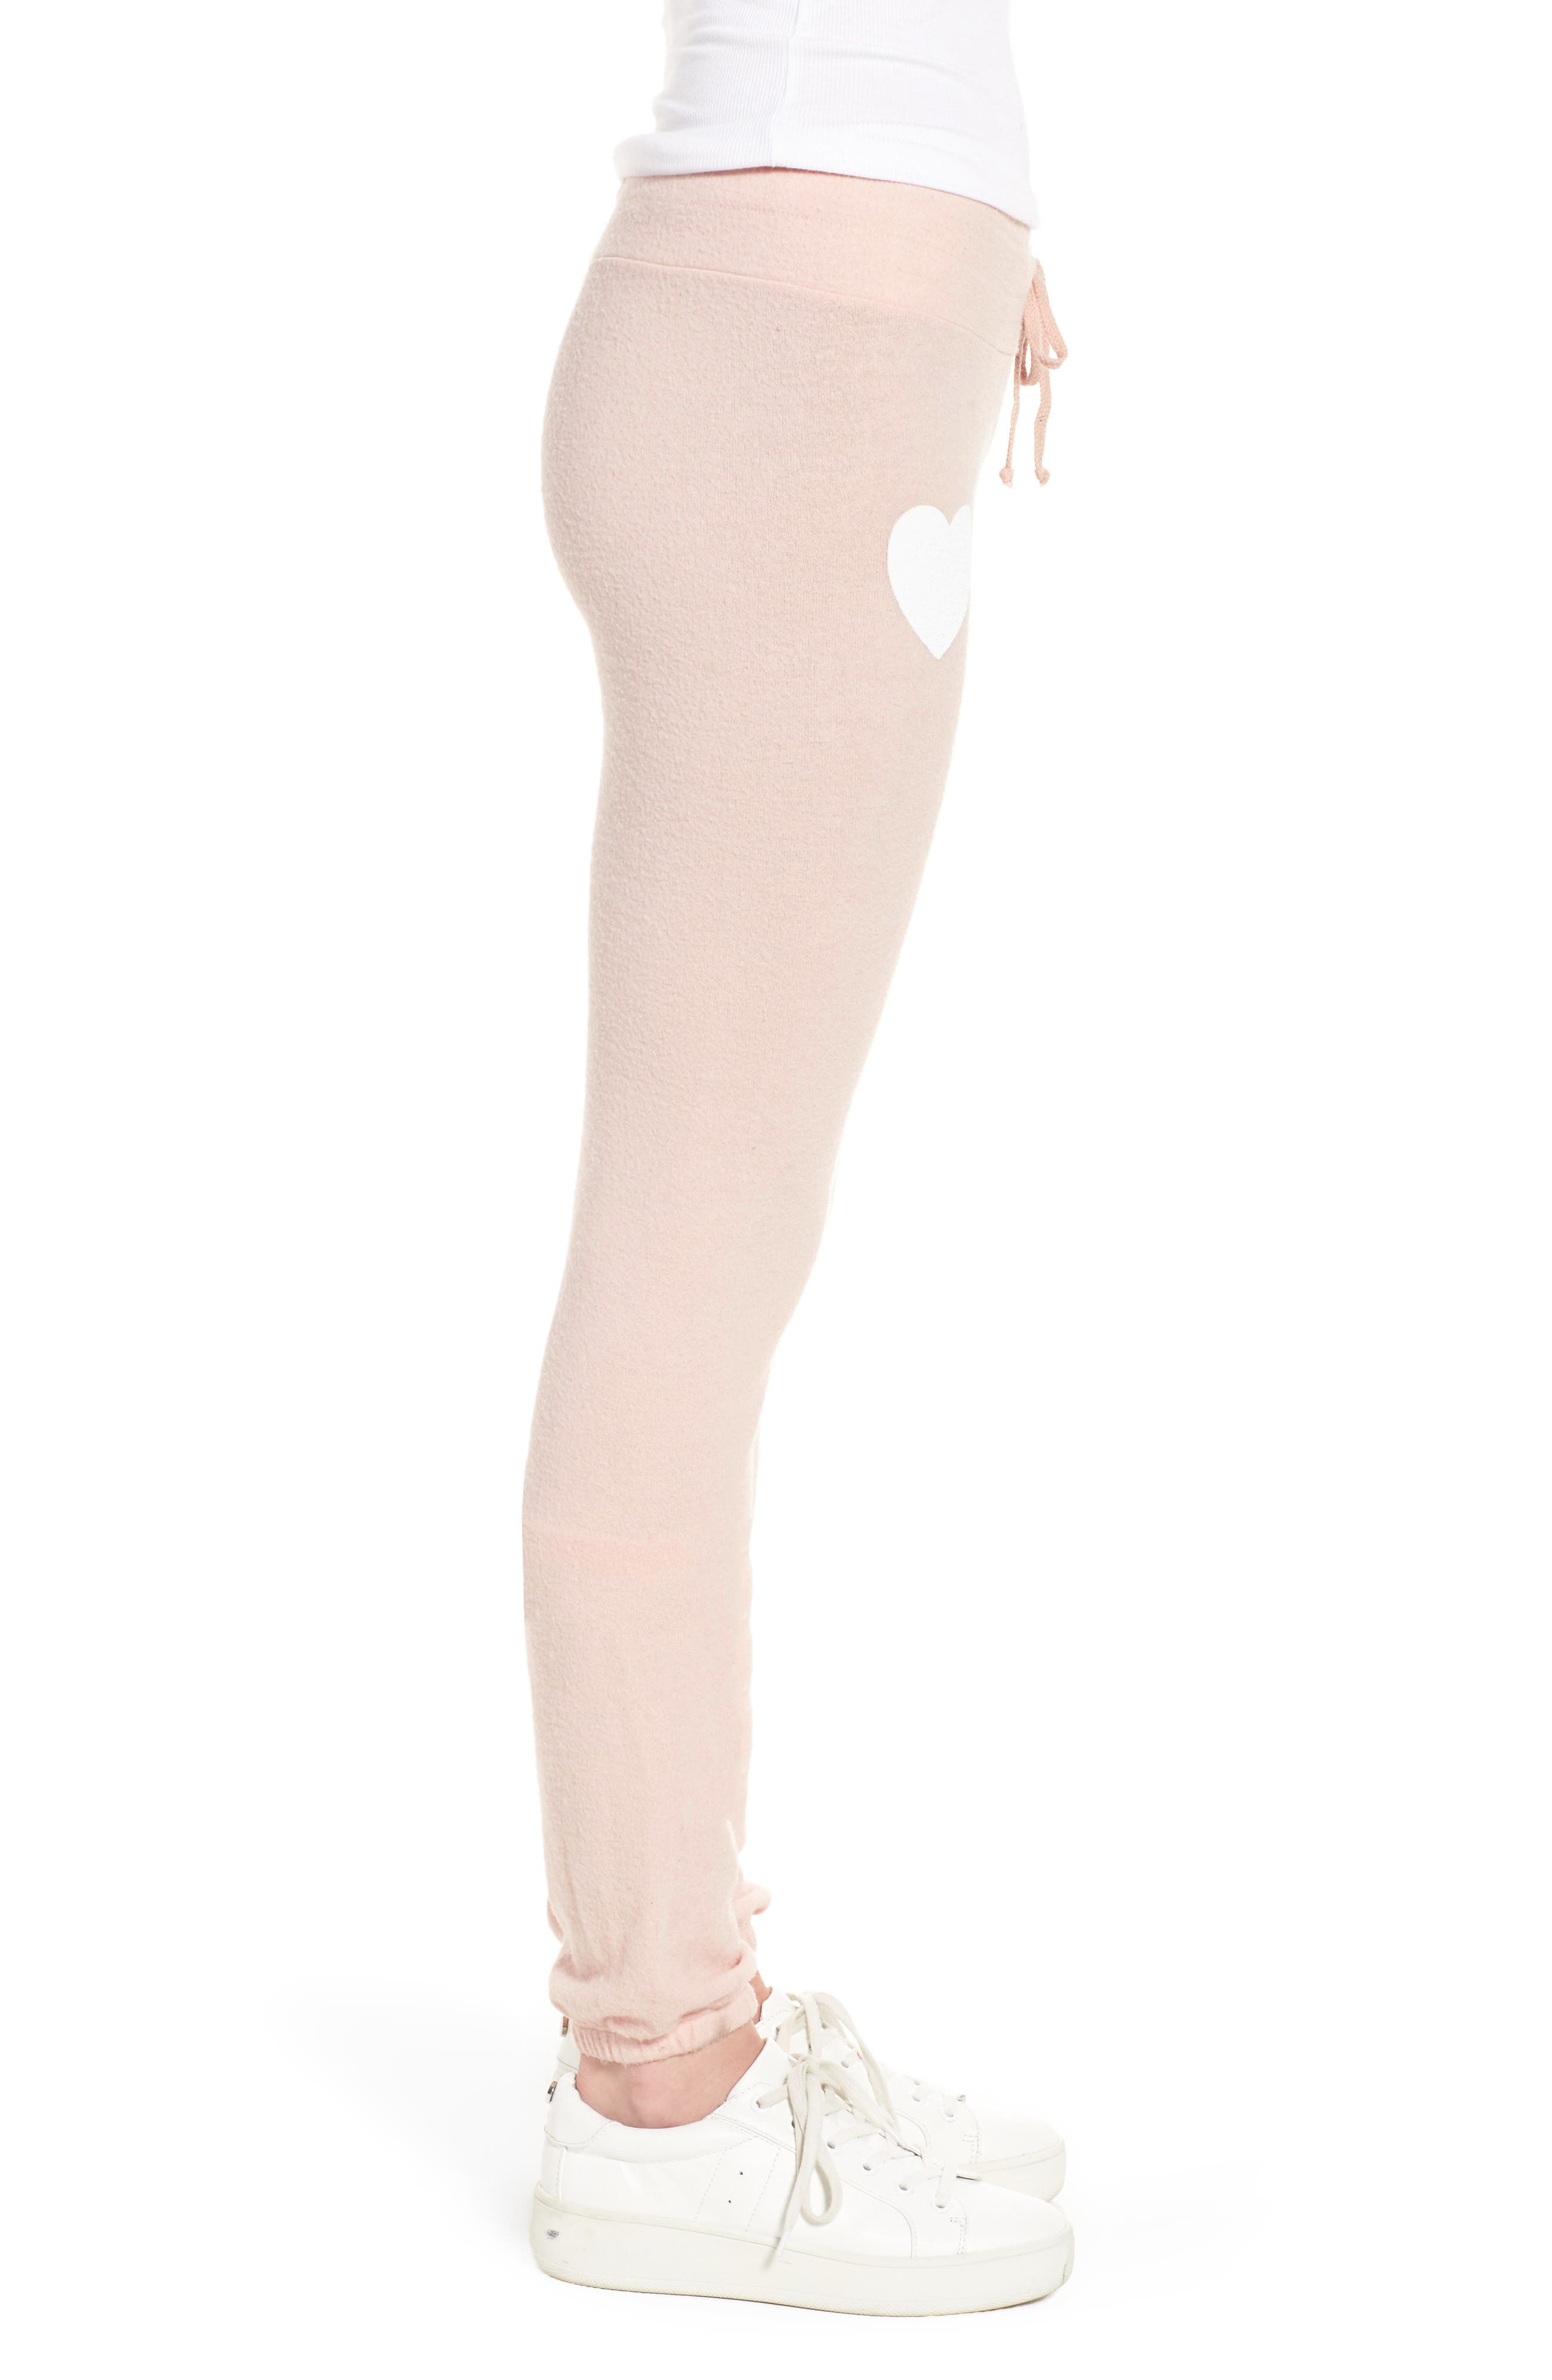 Rosé All Day Skinny Pants,                             Alternate thumbnail 3, color,                             650